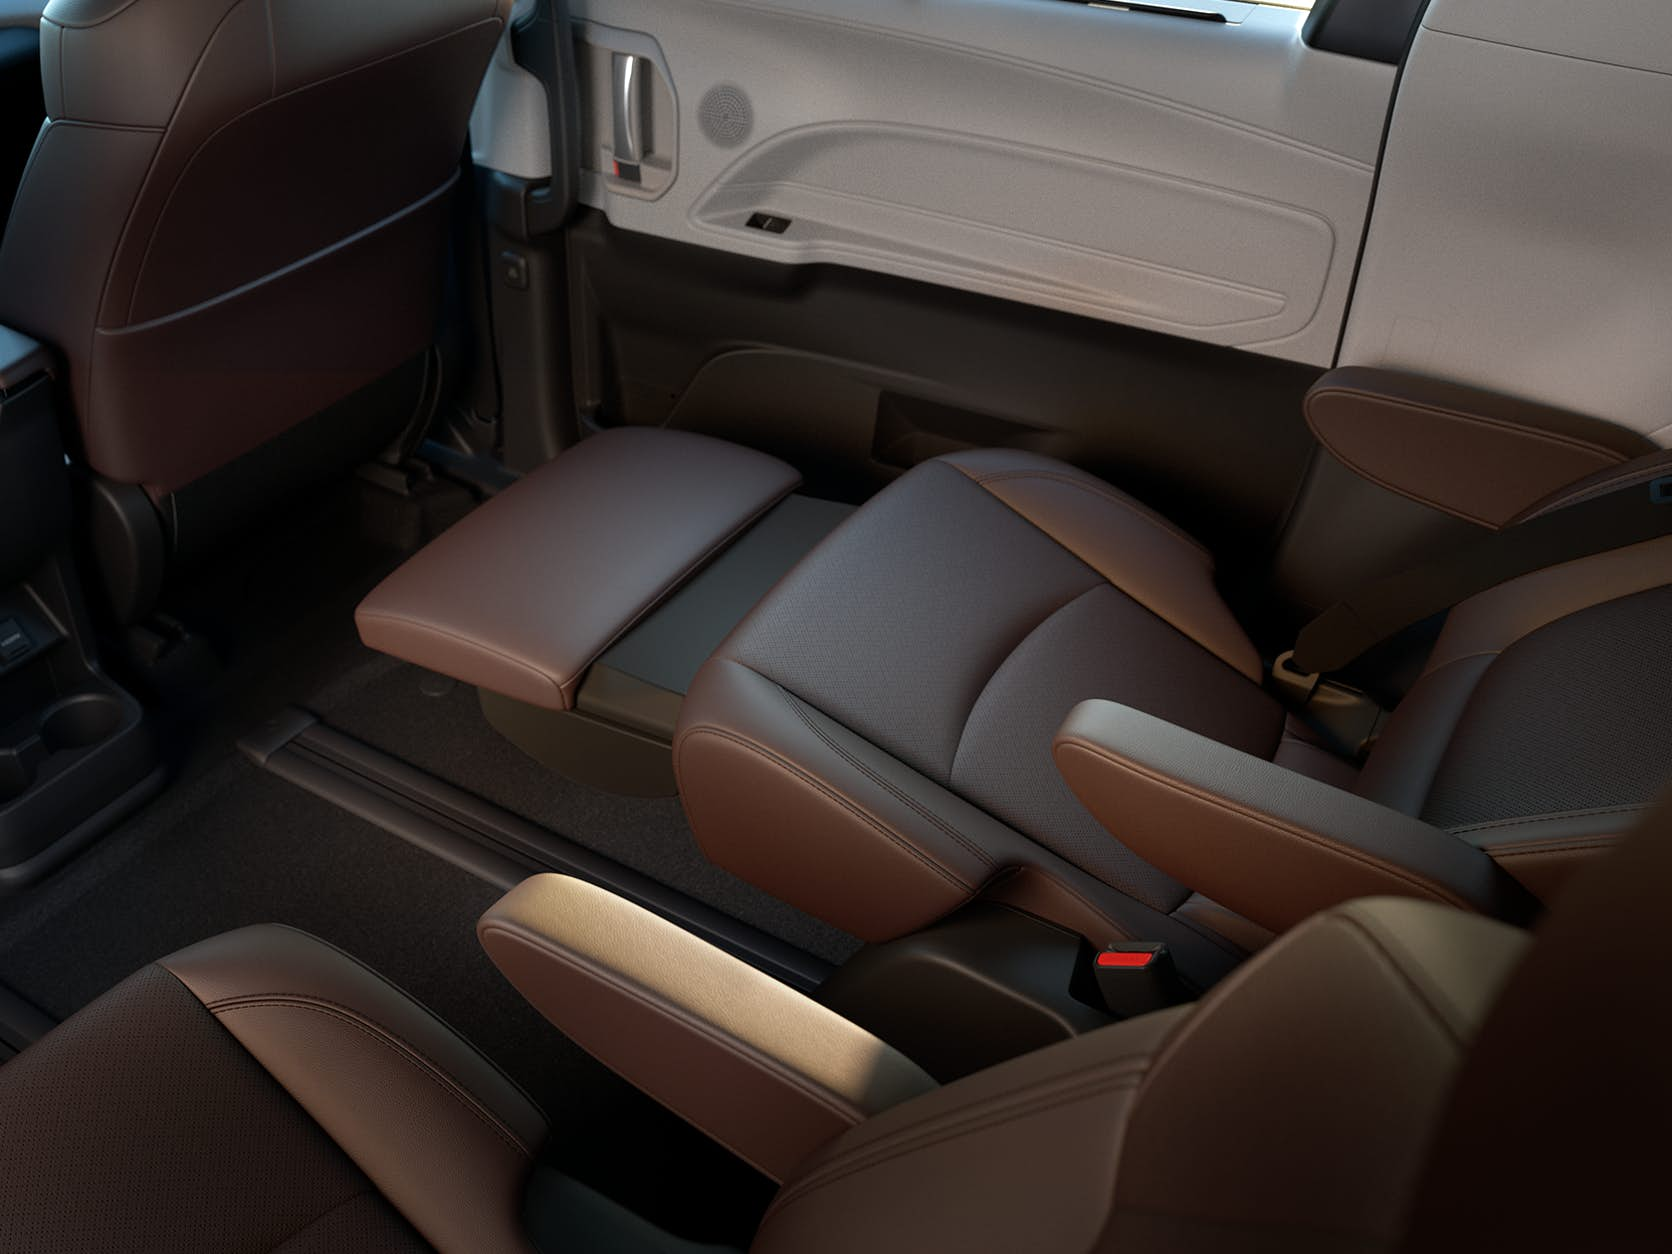 New Toyota Sienna rear passenger captains chair